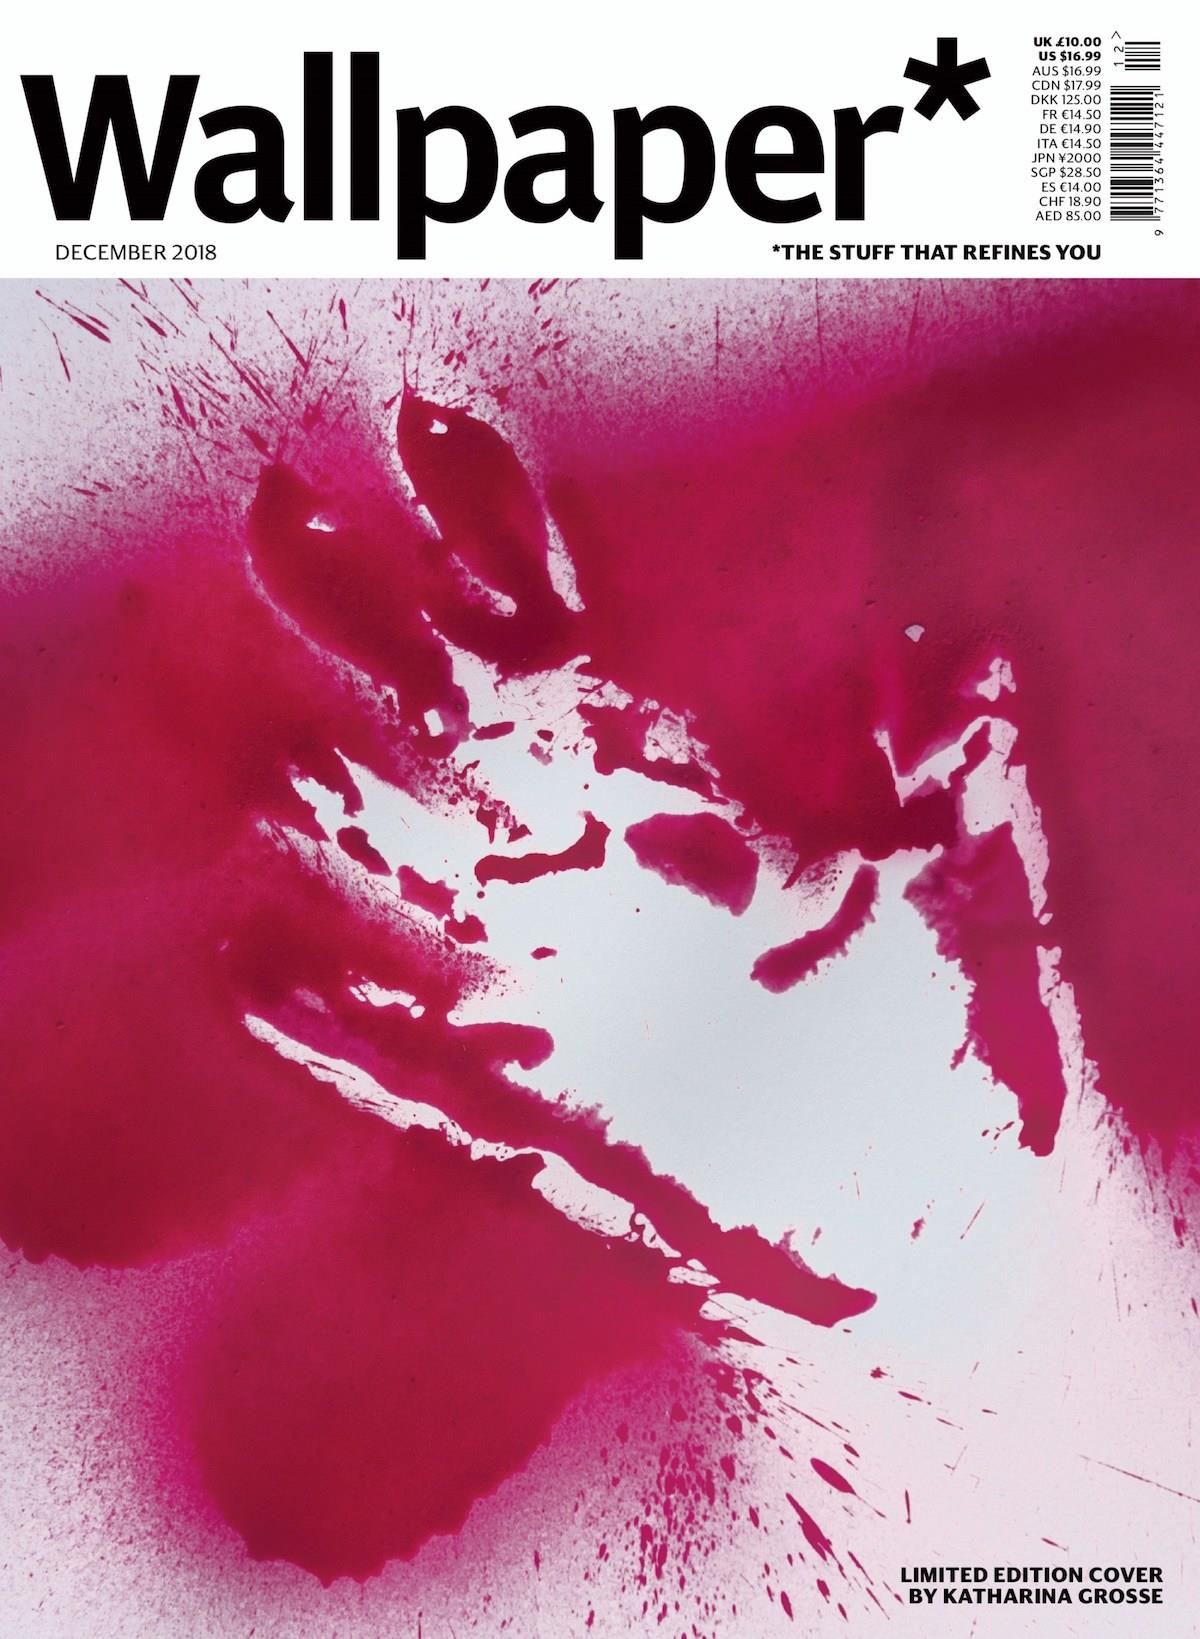 Wallpaper Magazine Announces Senior Team Changes News